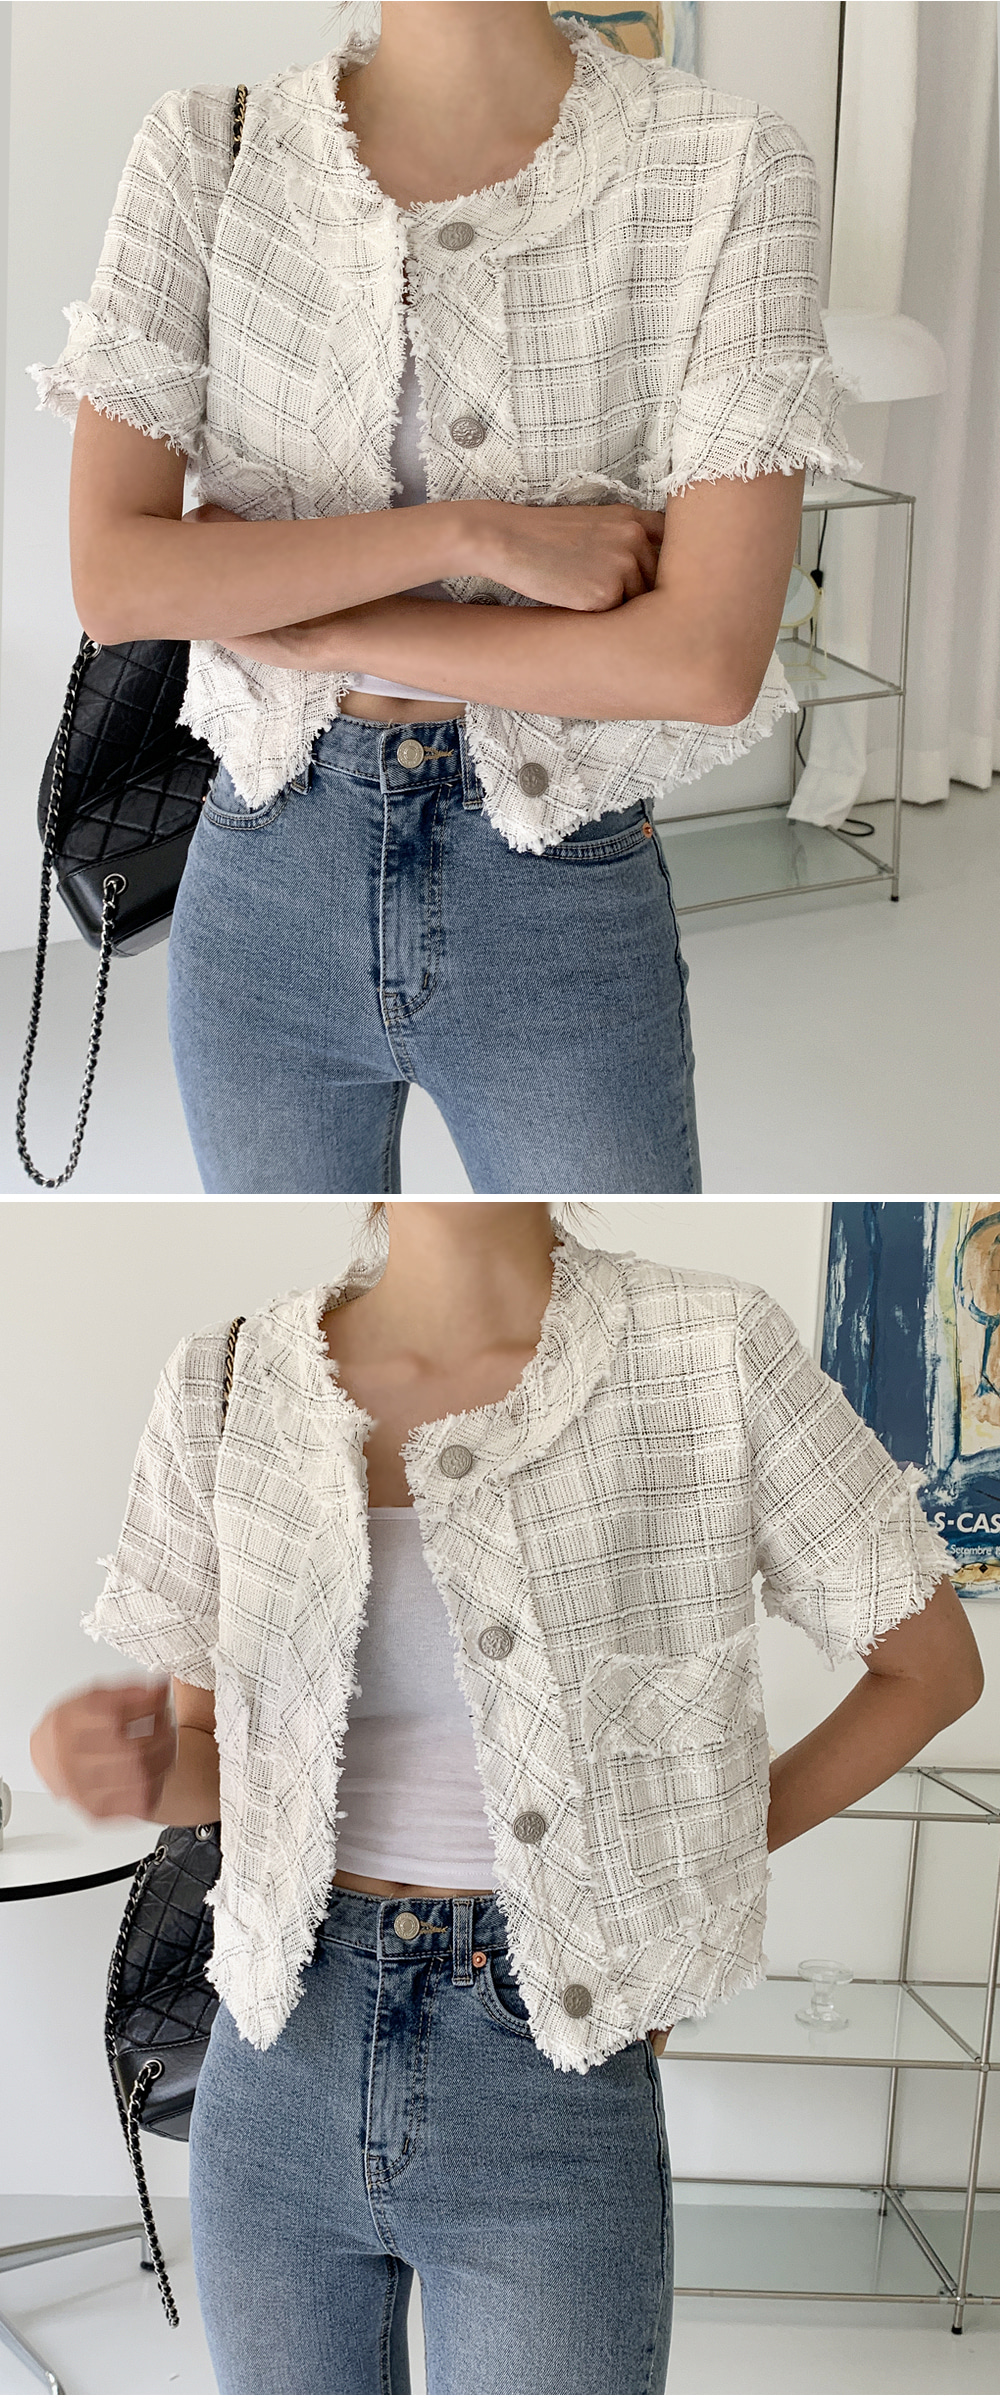 Liz half jacket